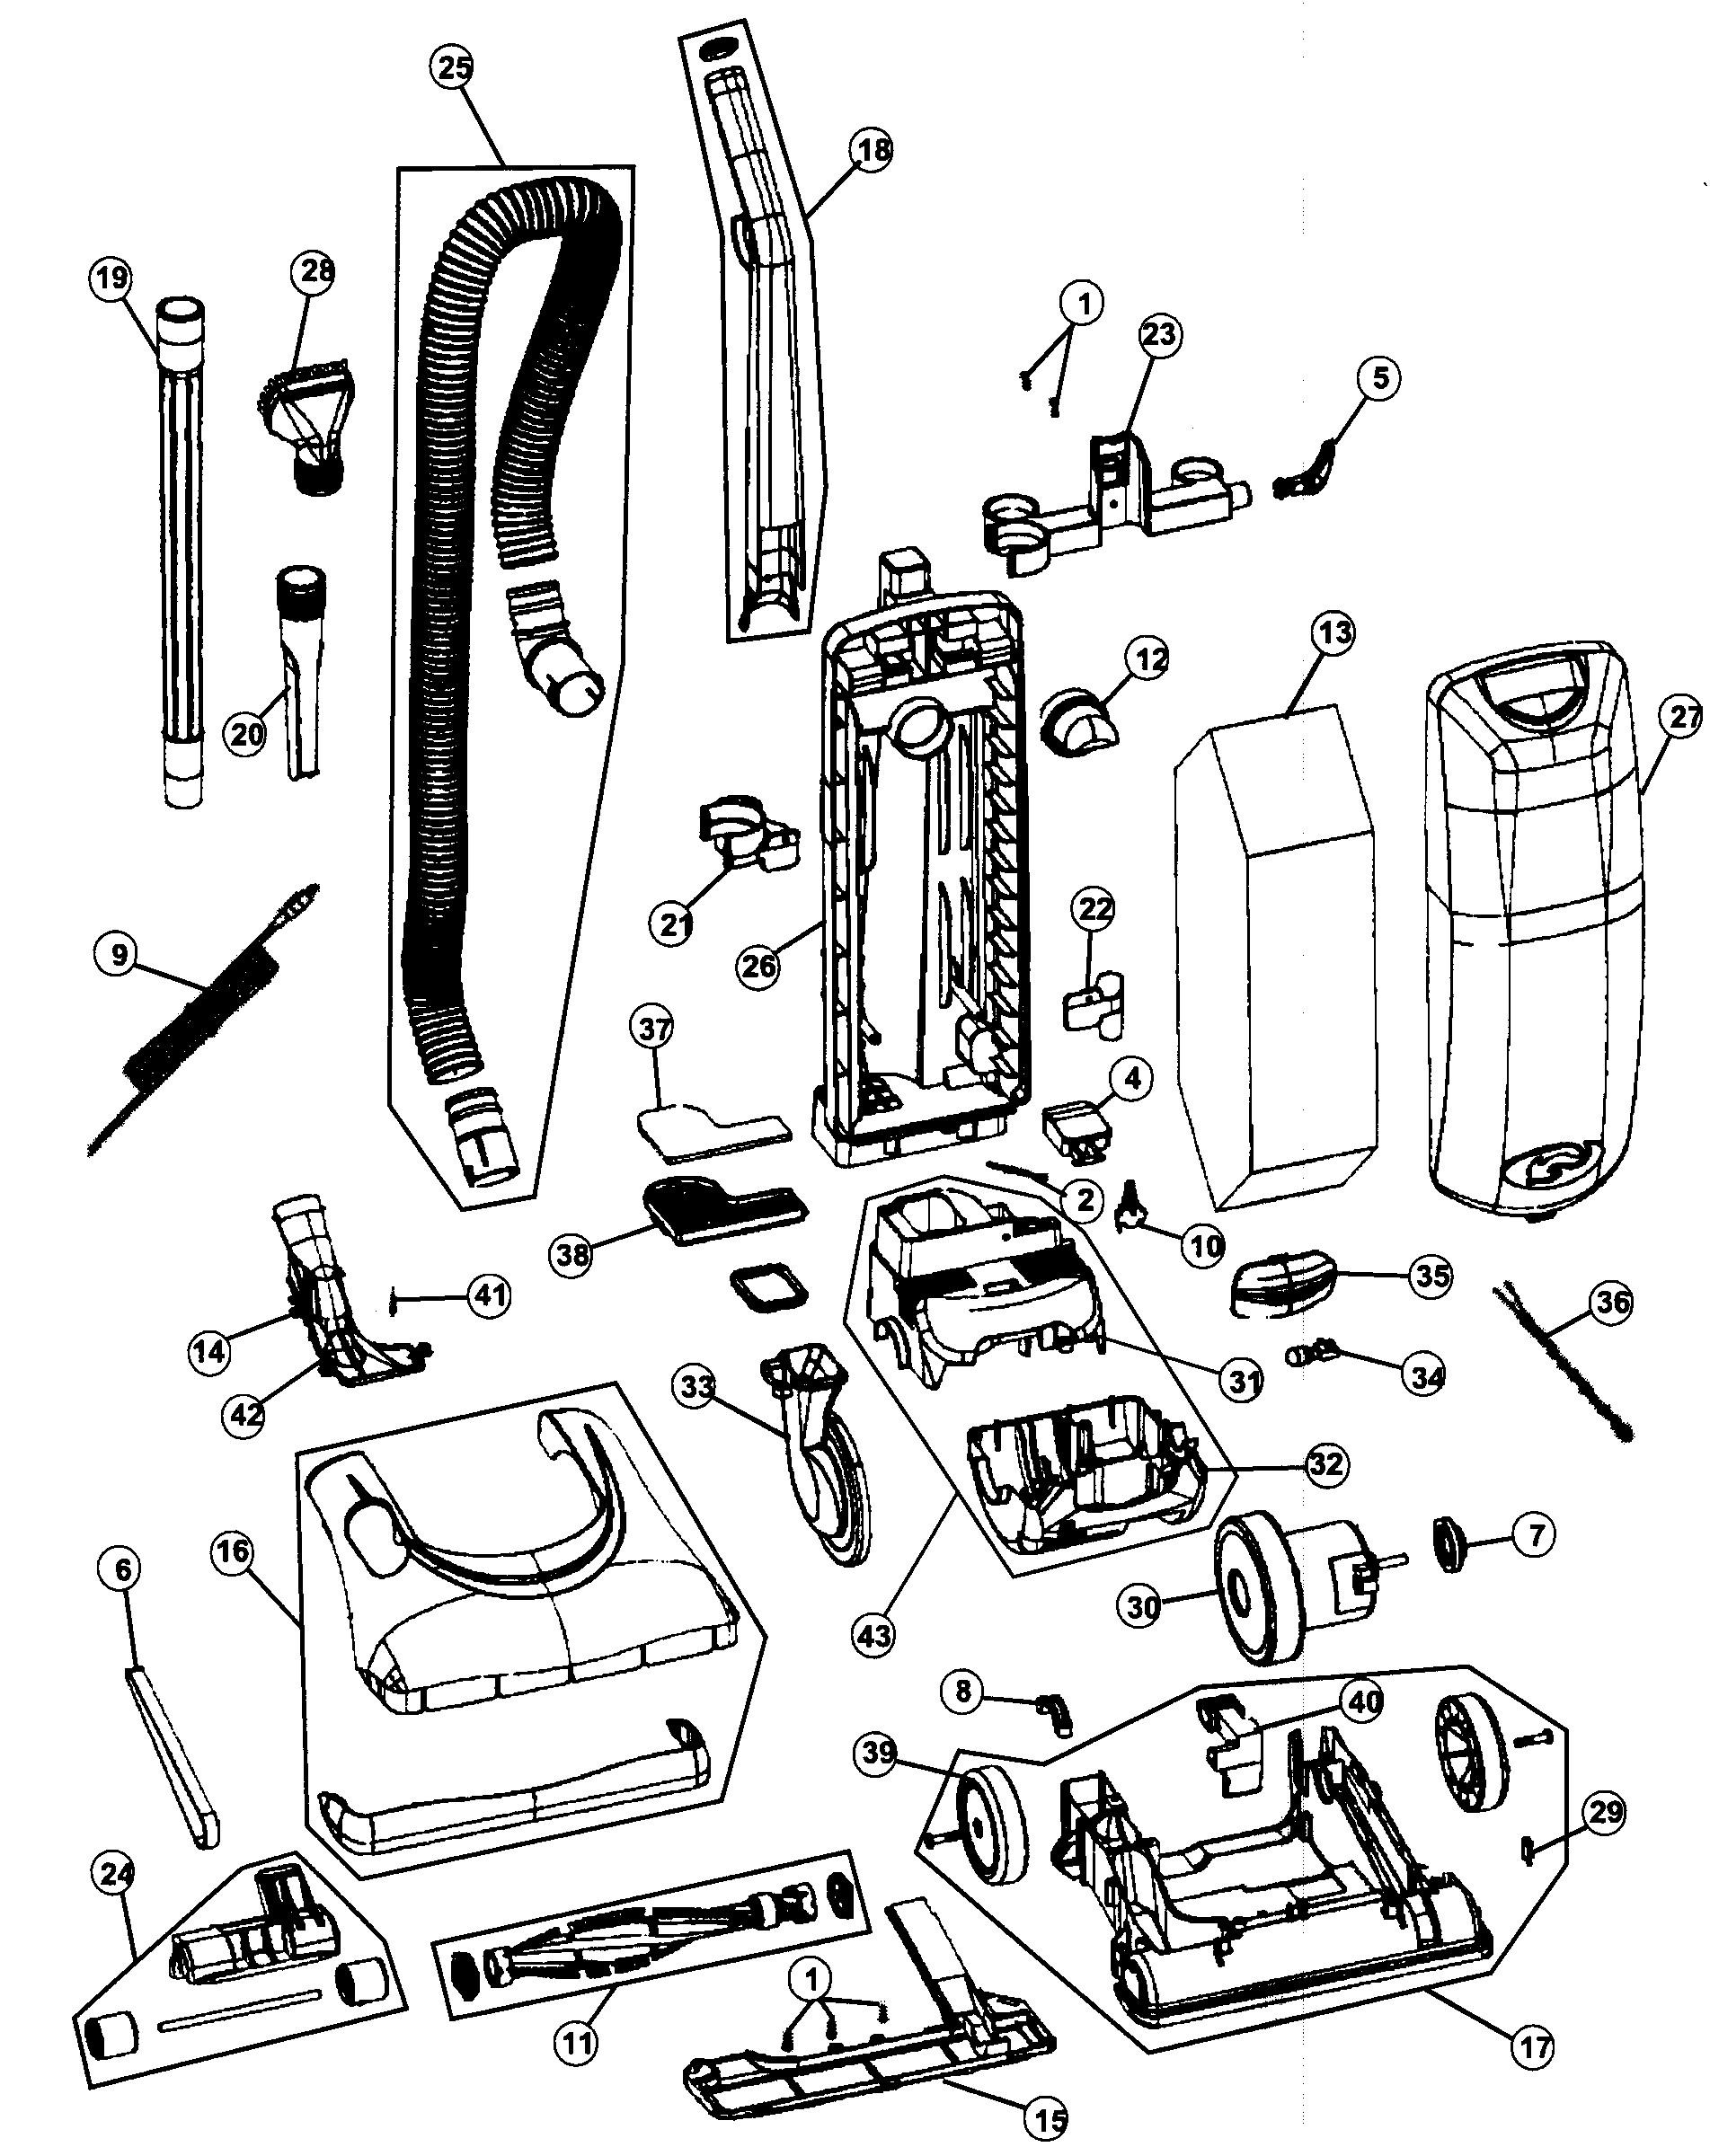 Dyson Dc24 Parts Diagram Vacuum Vacuum Parts Of Dyson Dc24 Parts Diagram